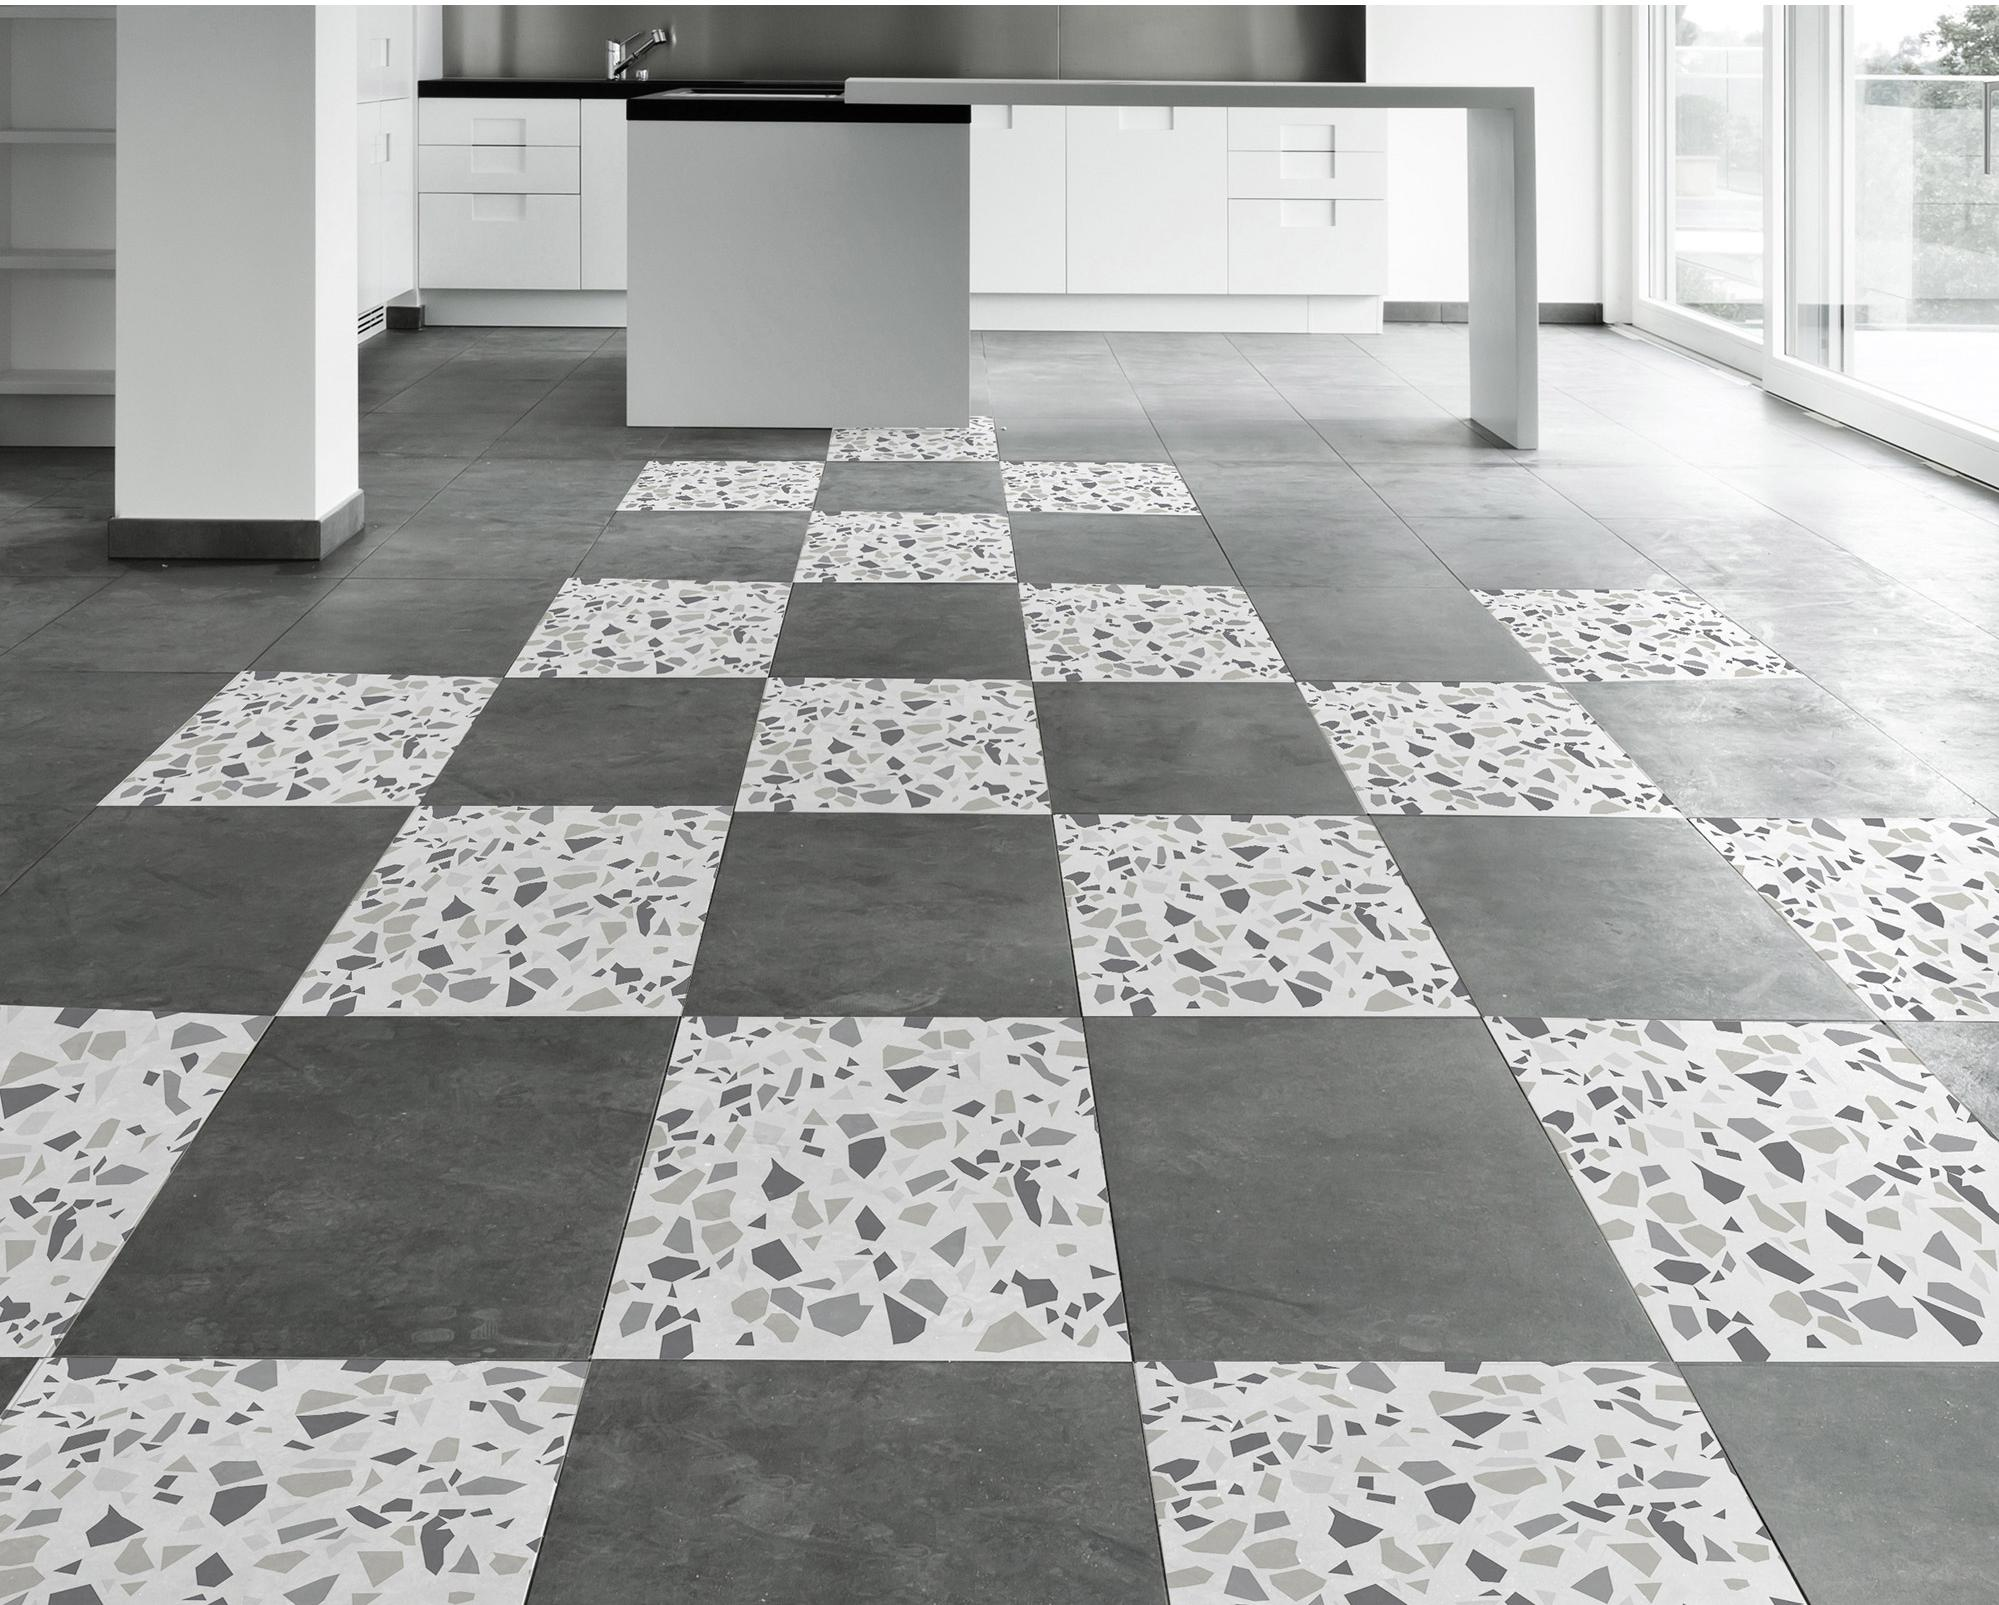 stickers adh sifs carrelage sol terrazzo gris 20 cm x 20. Black Bedroom Furniture Sets. Home Design Ideas